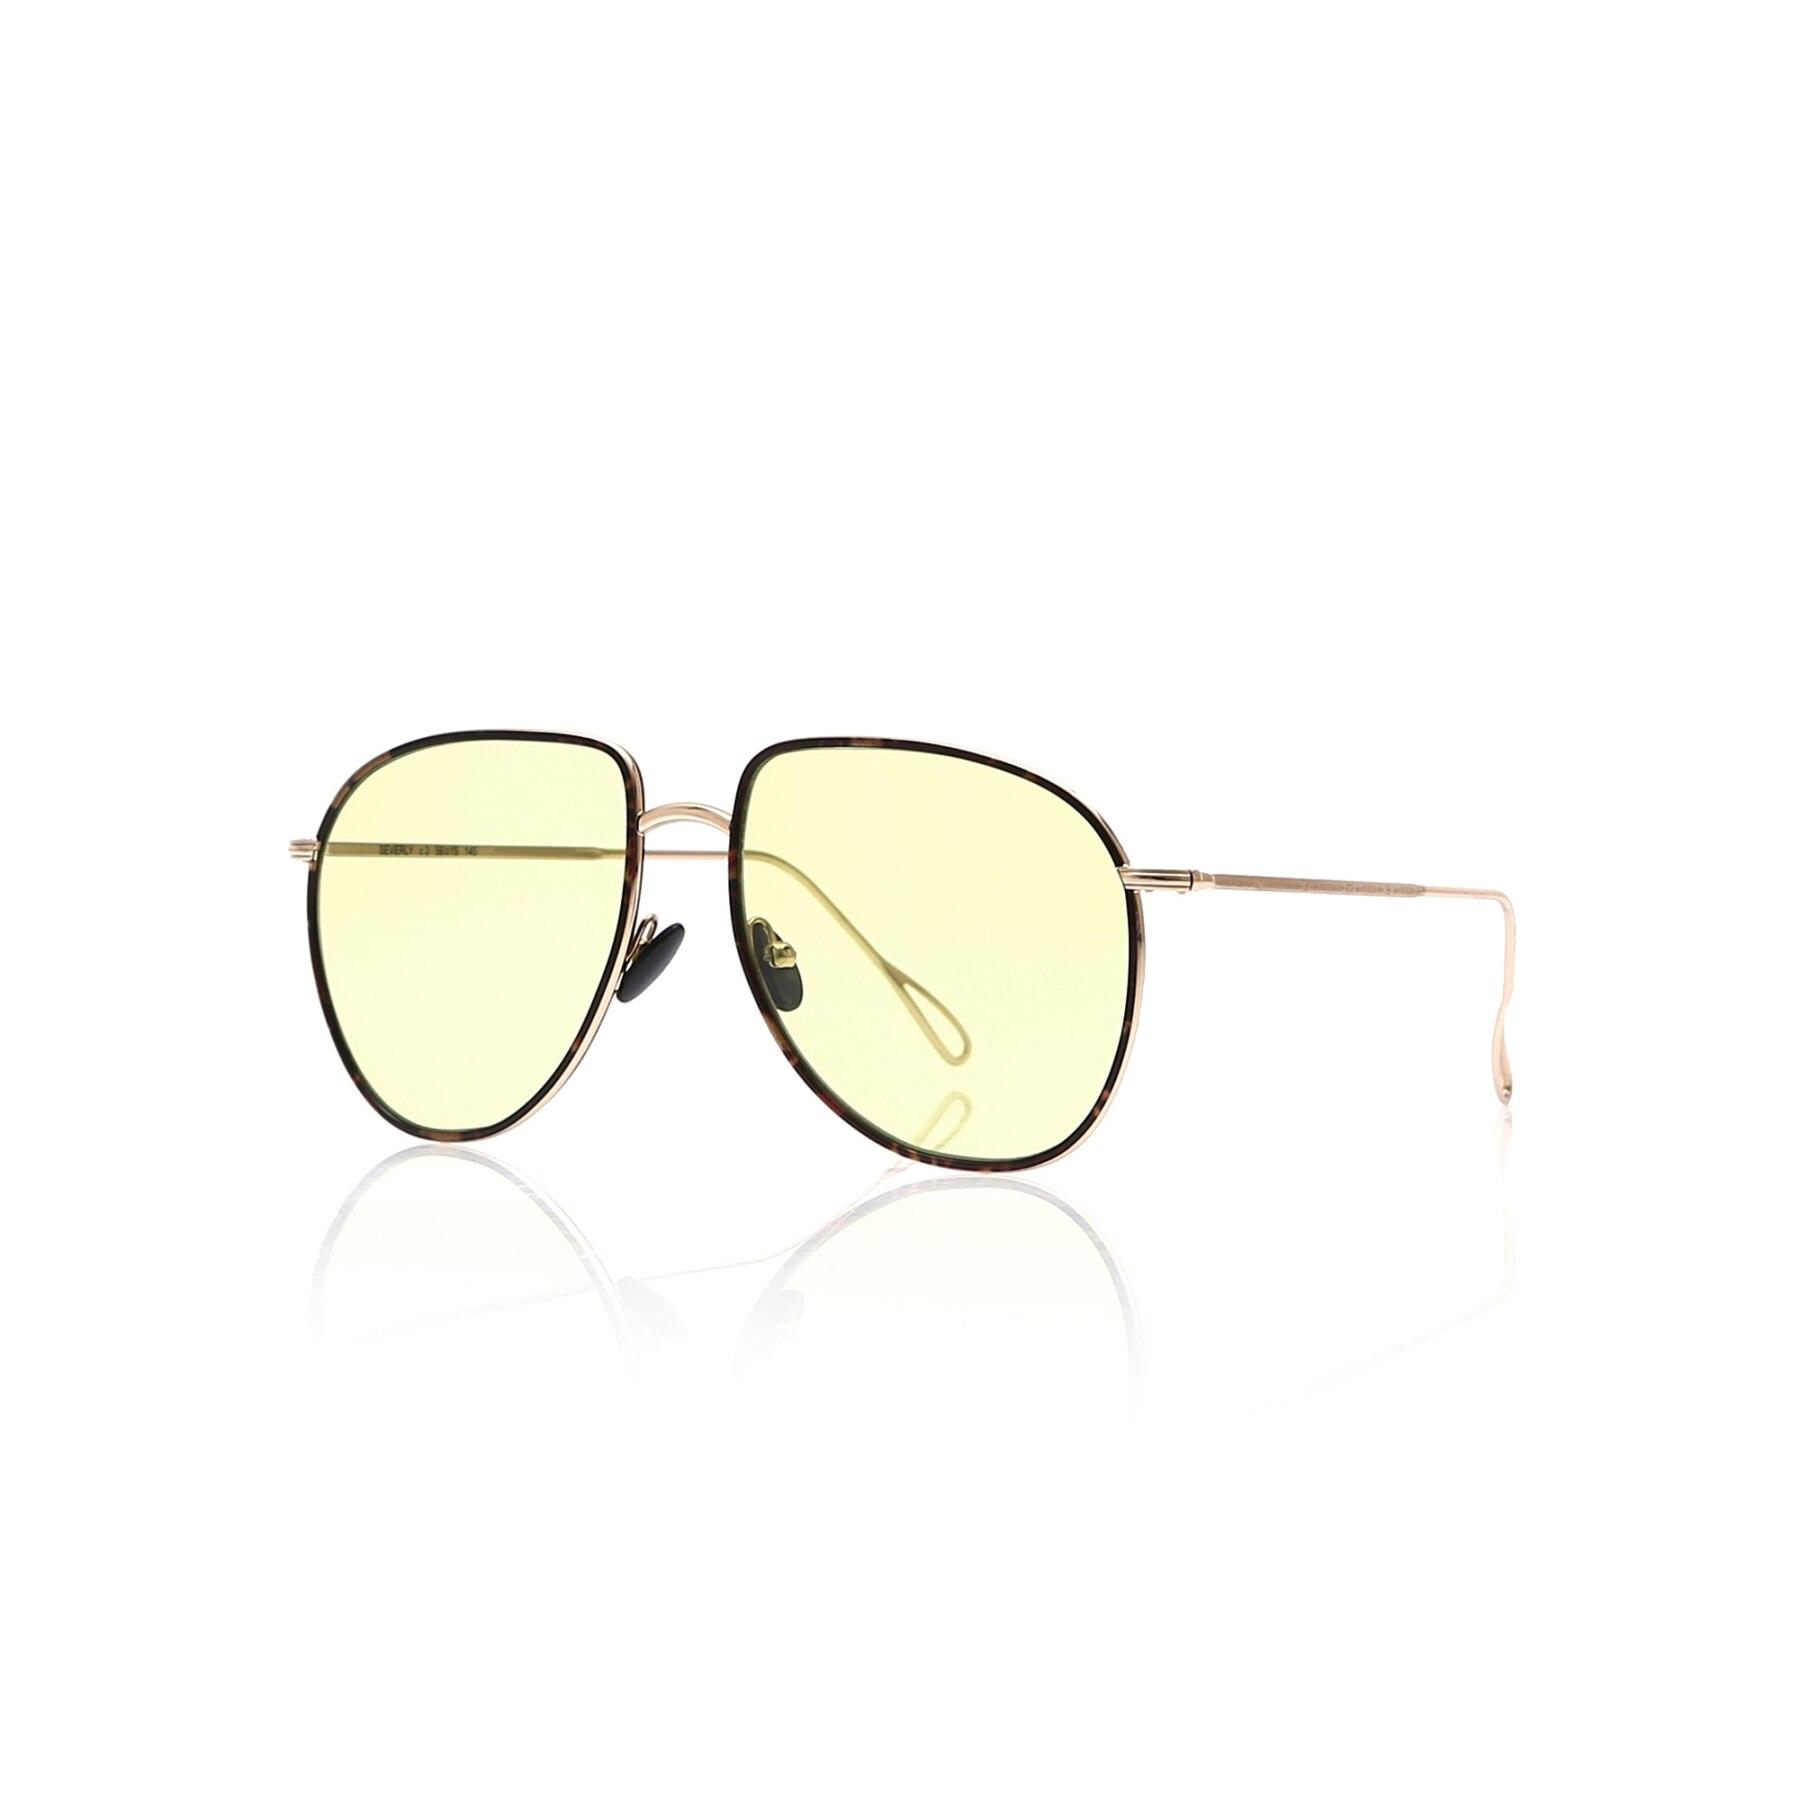 Women's sunglasses beverly 3 metal Brown organic pilot pilot 56-15-145 cyme